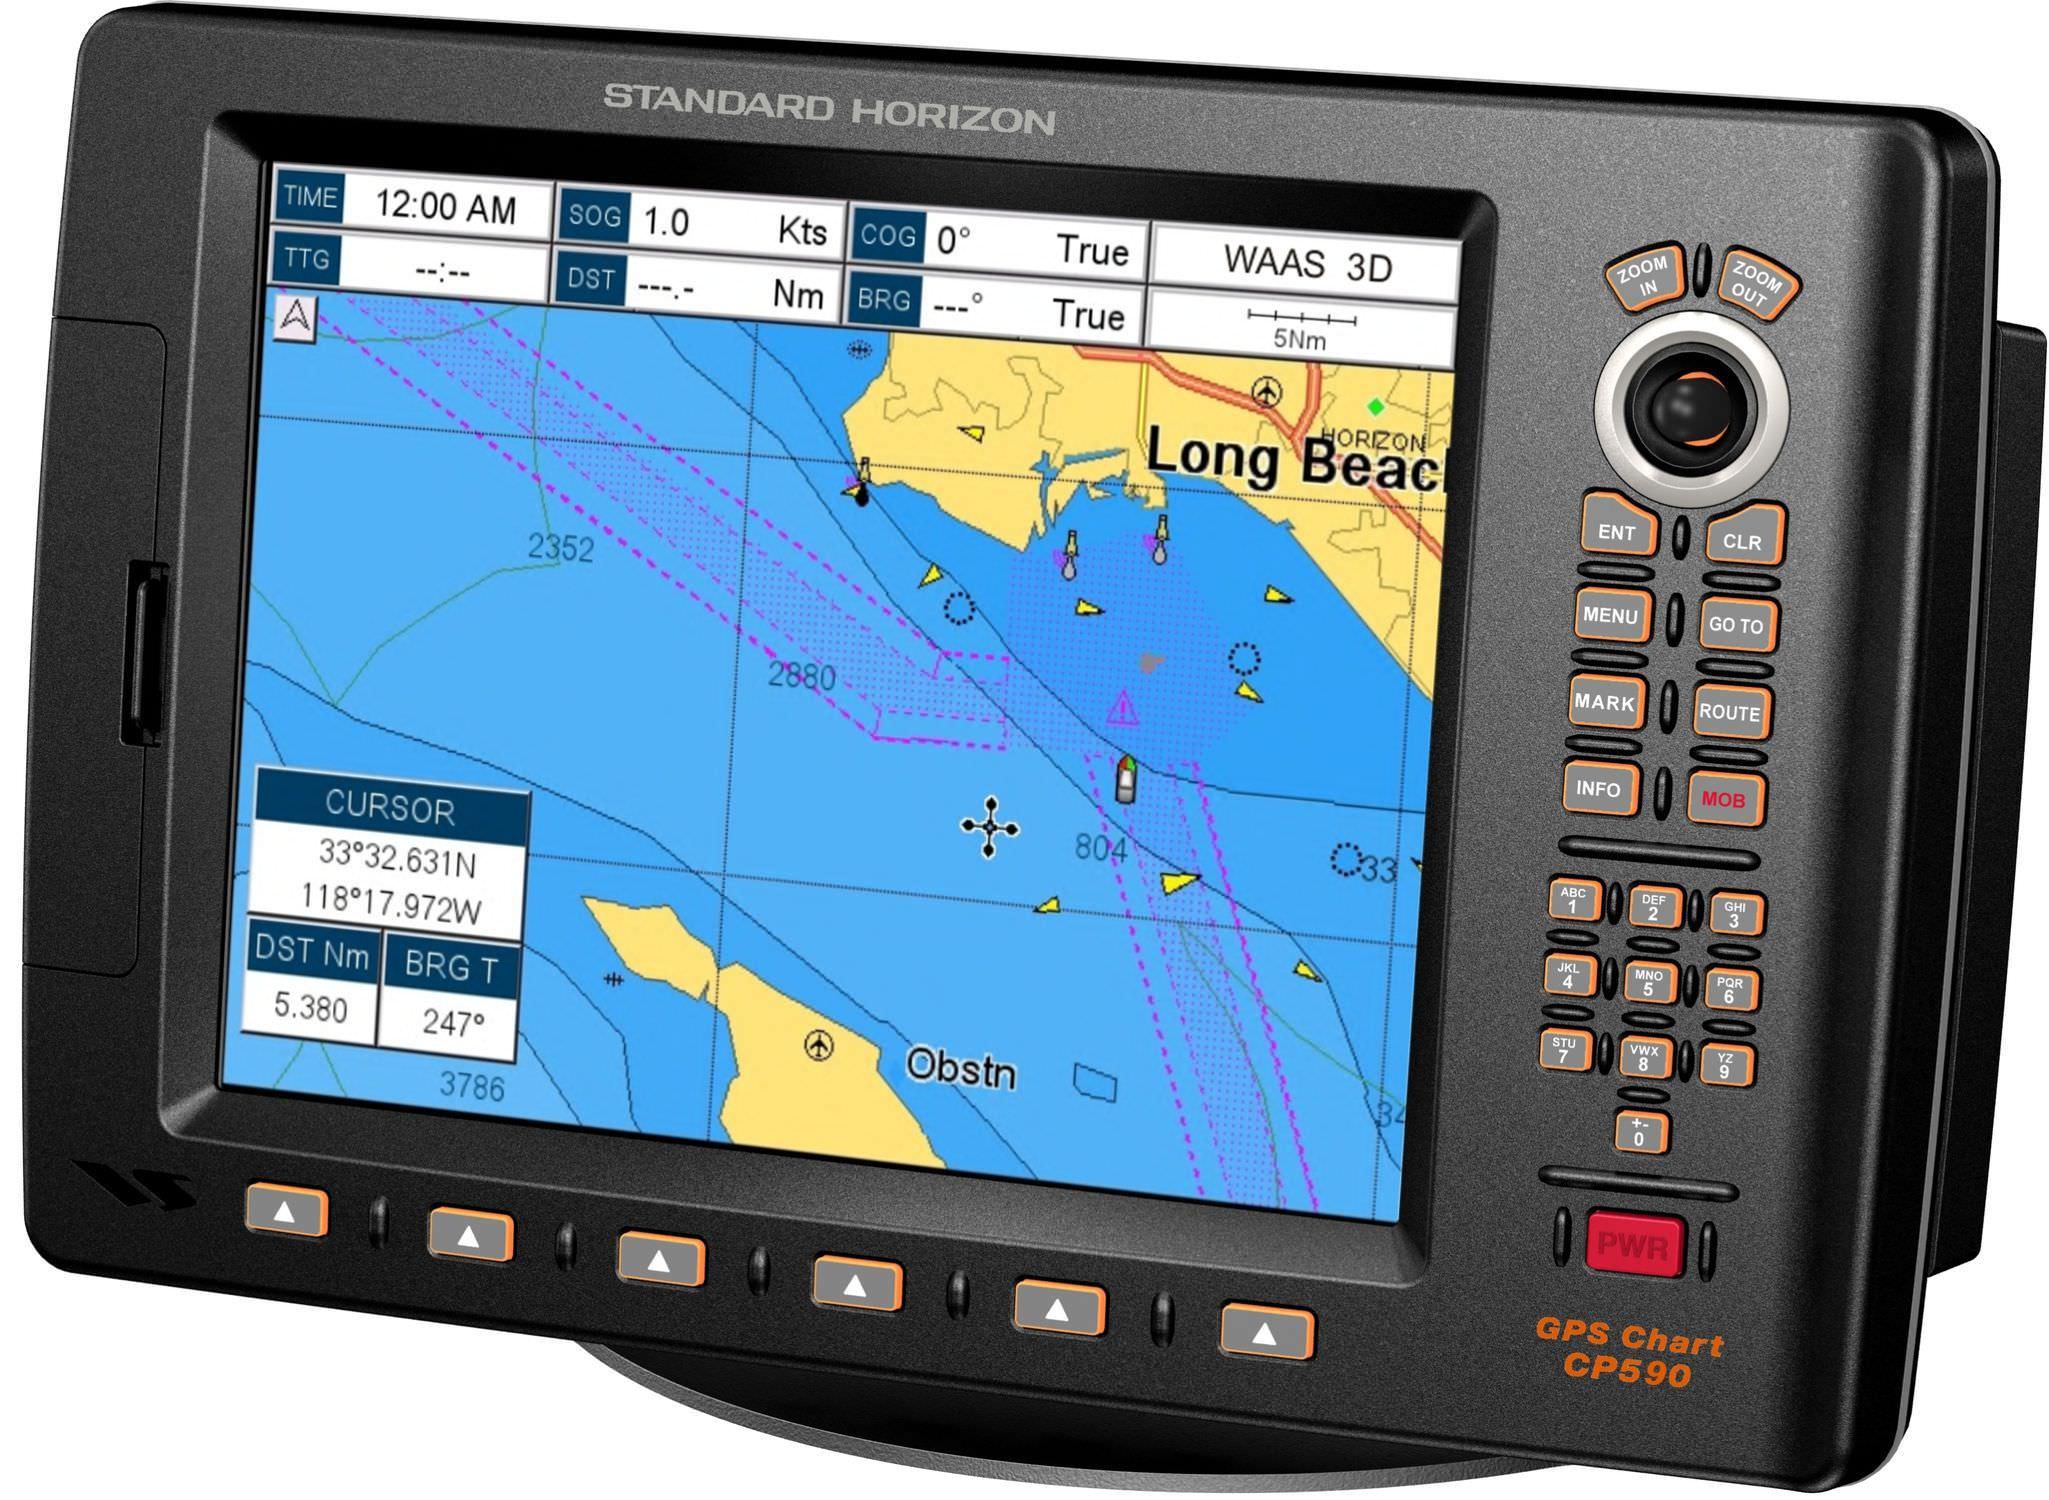 Chart plotter / radio / AIS / GPS - CP590 NC - Standard horizon on